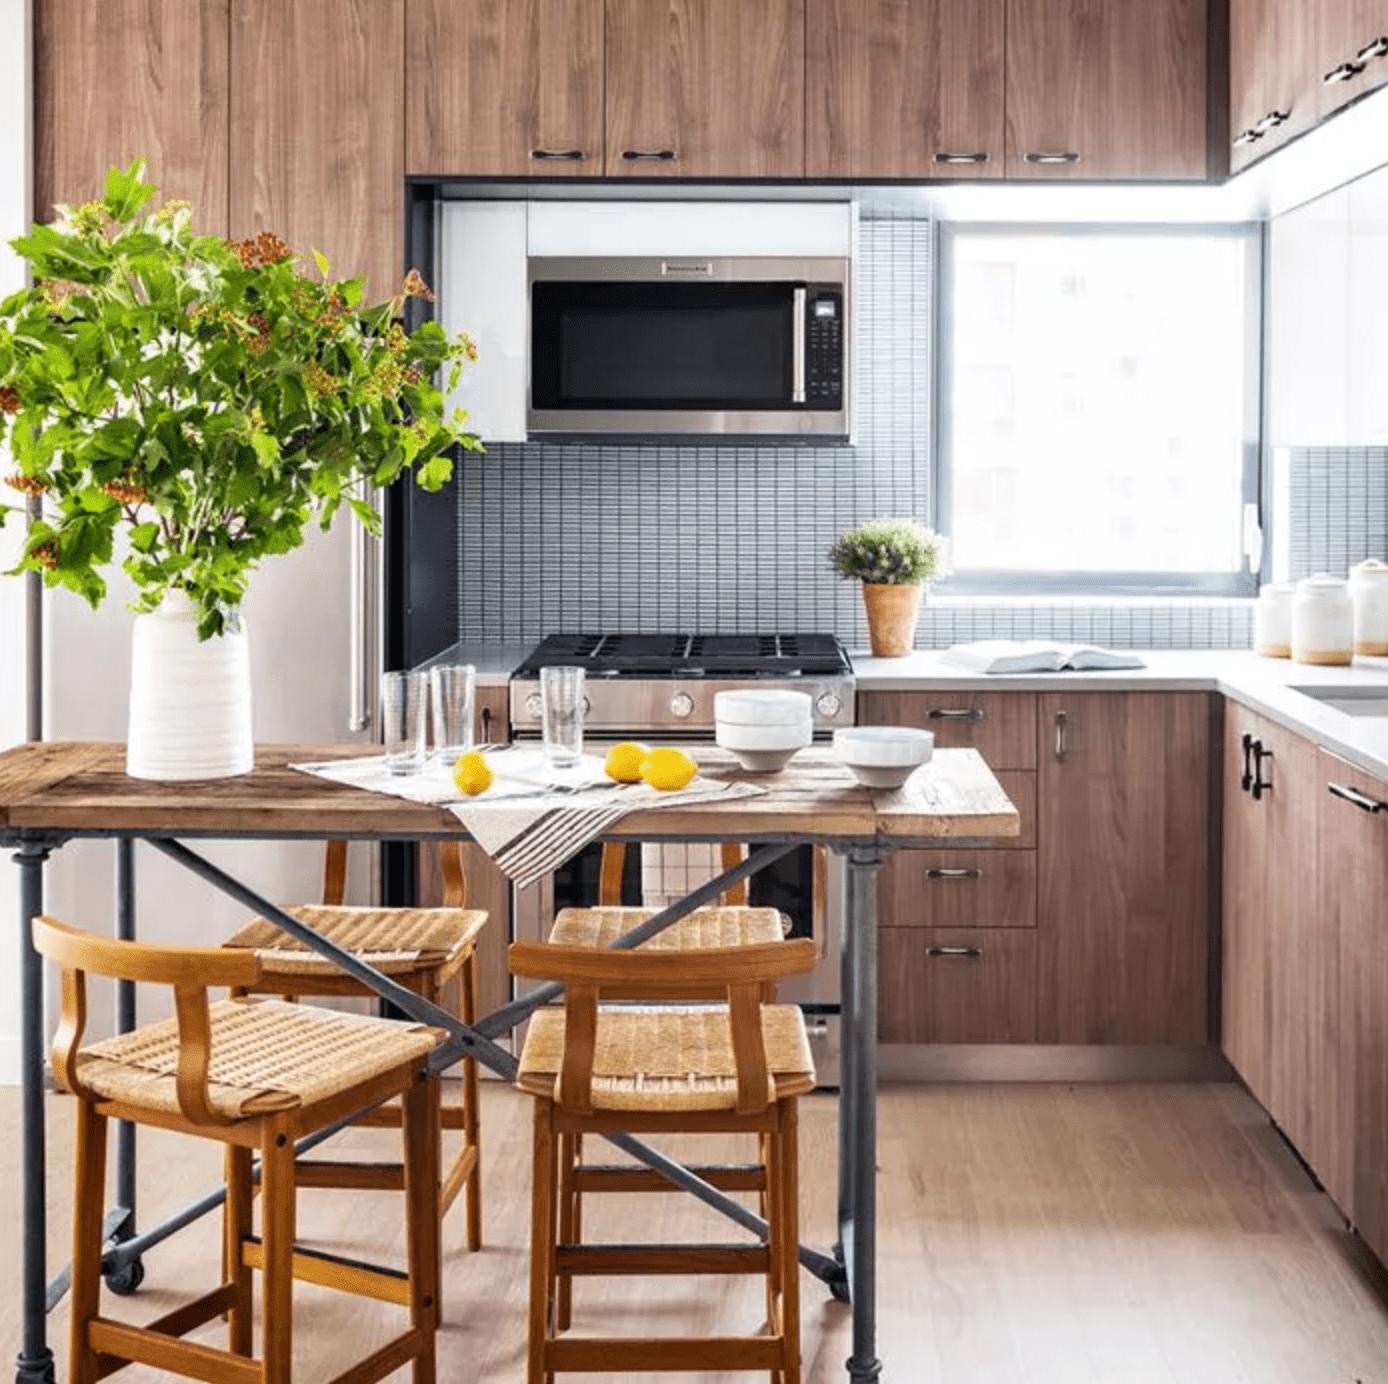 25 White And Wood Kitchen Ideas: 25 Beautiful Small Kitchen Ideas